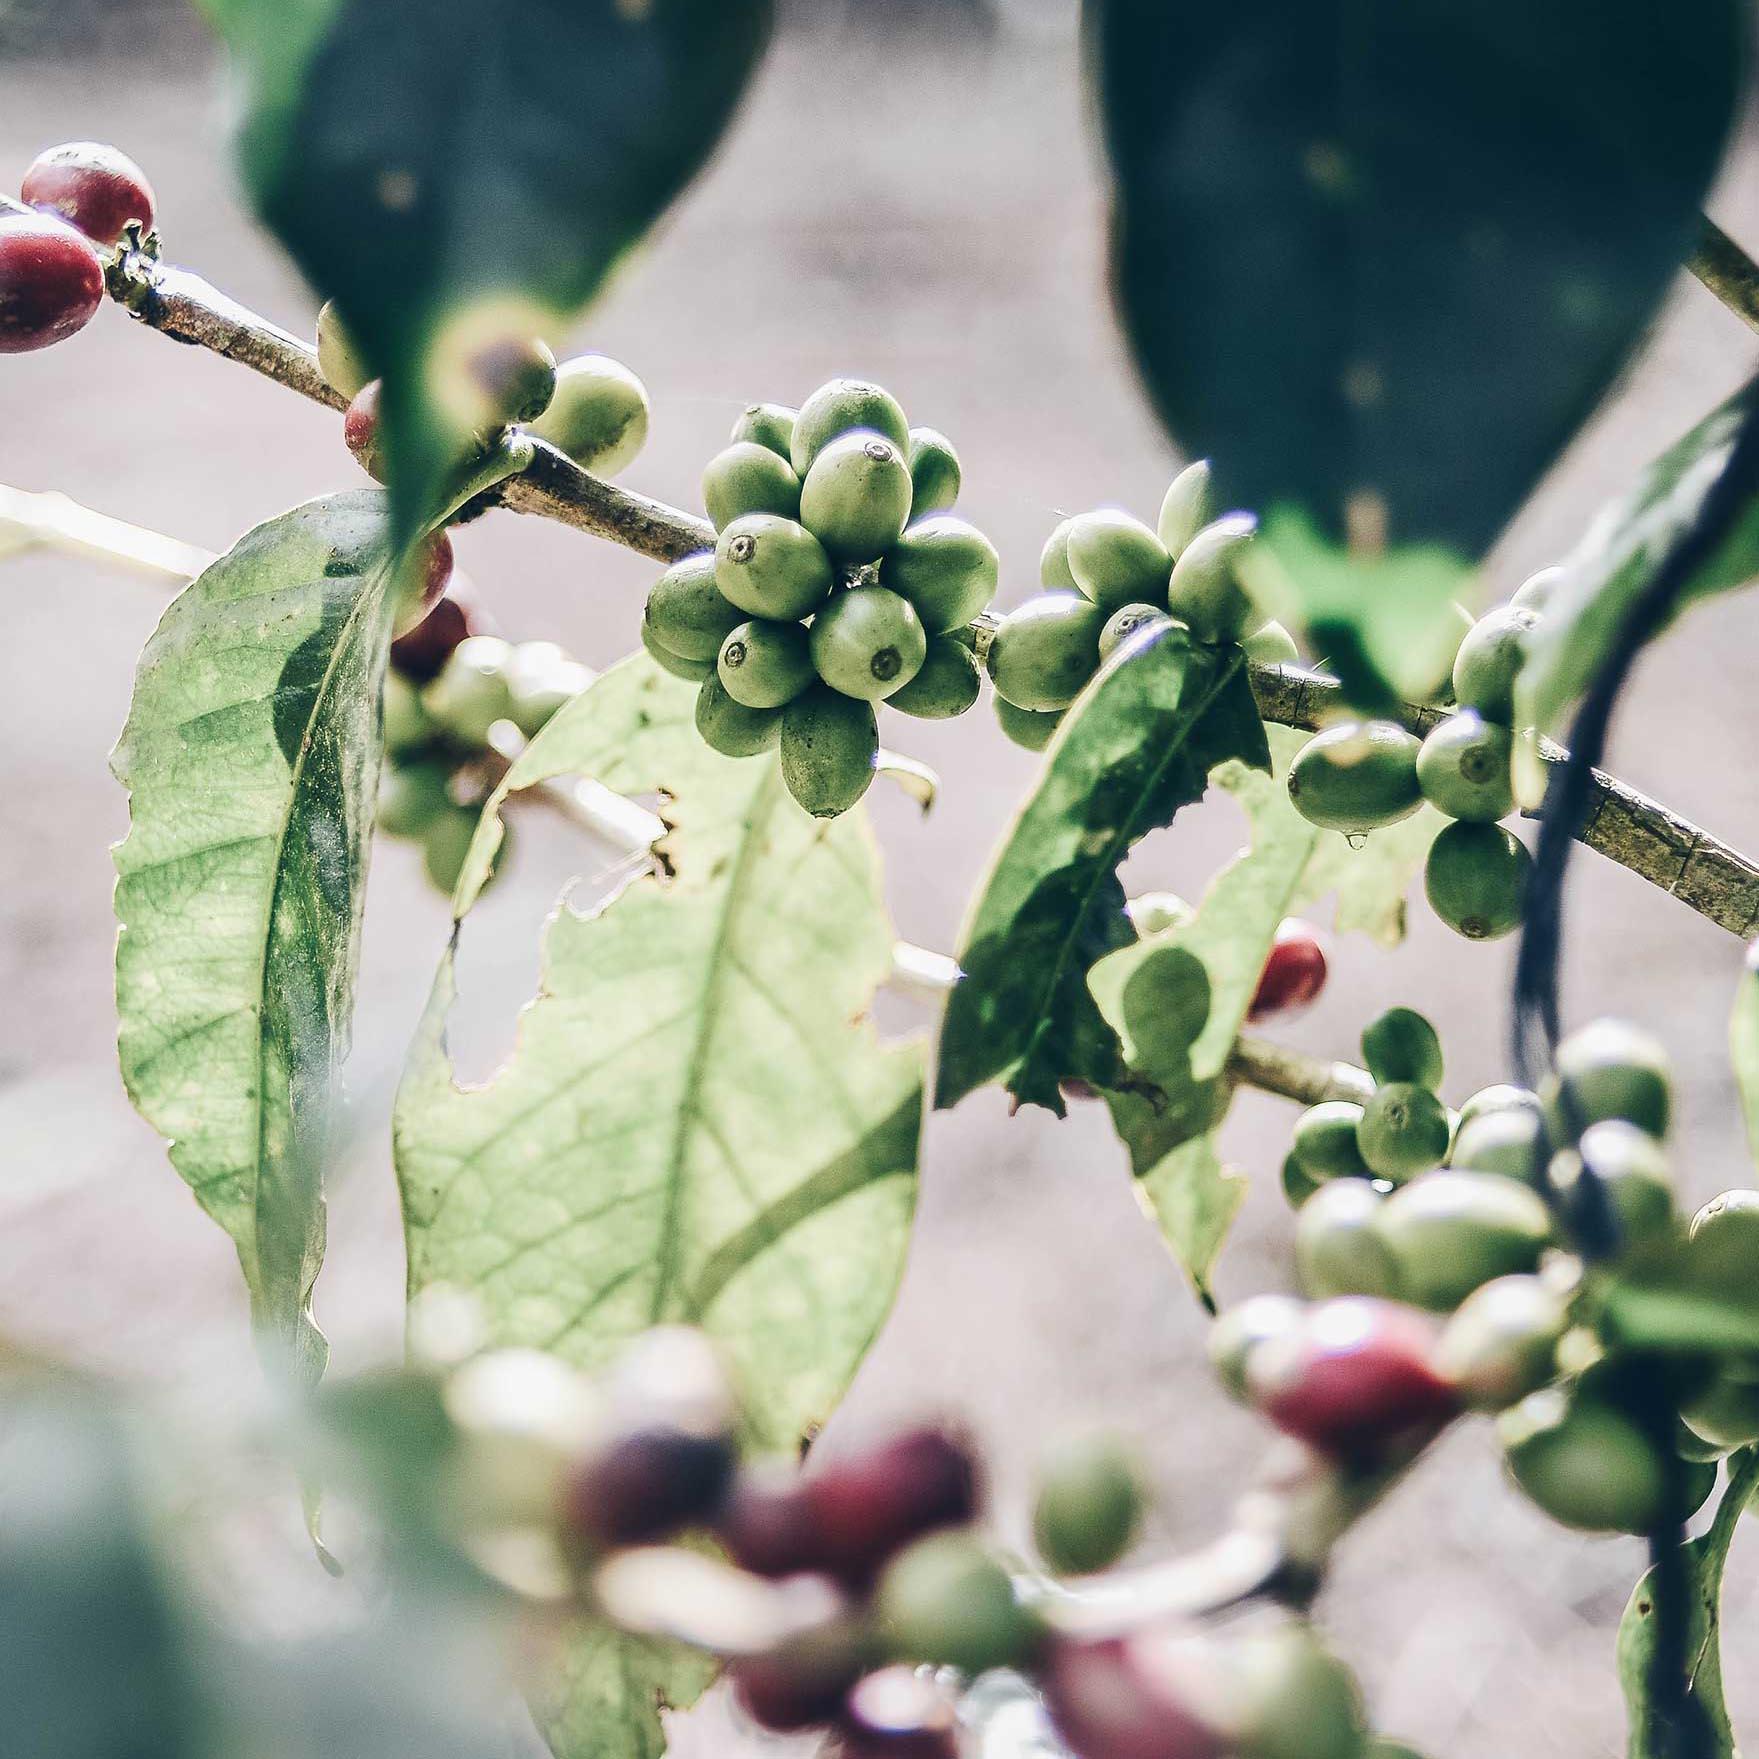 1TwinEngineCoffee-Plant-Coffee.jpg